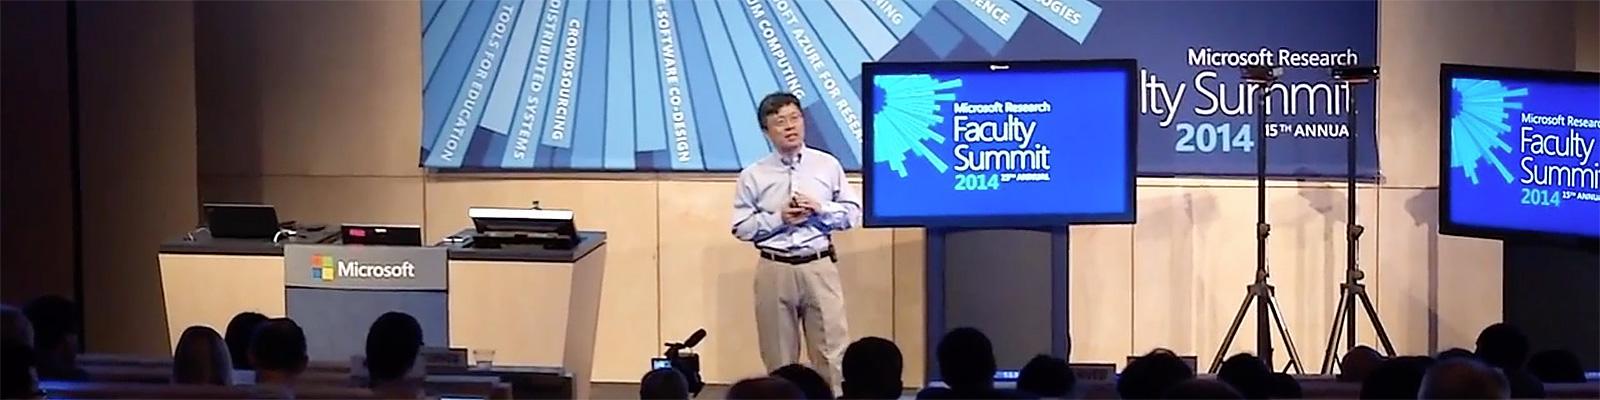 Harry Shum: Faculty Summit 2014 Keynote(Microsoft Research)